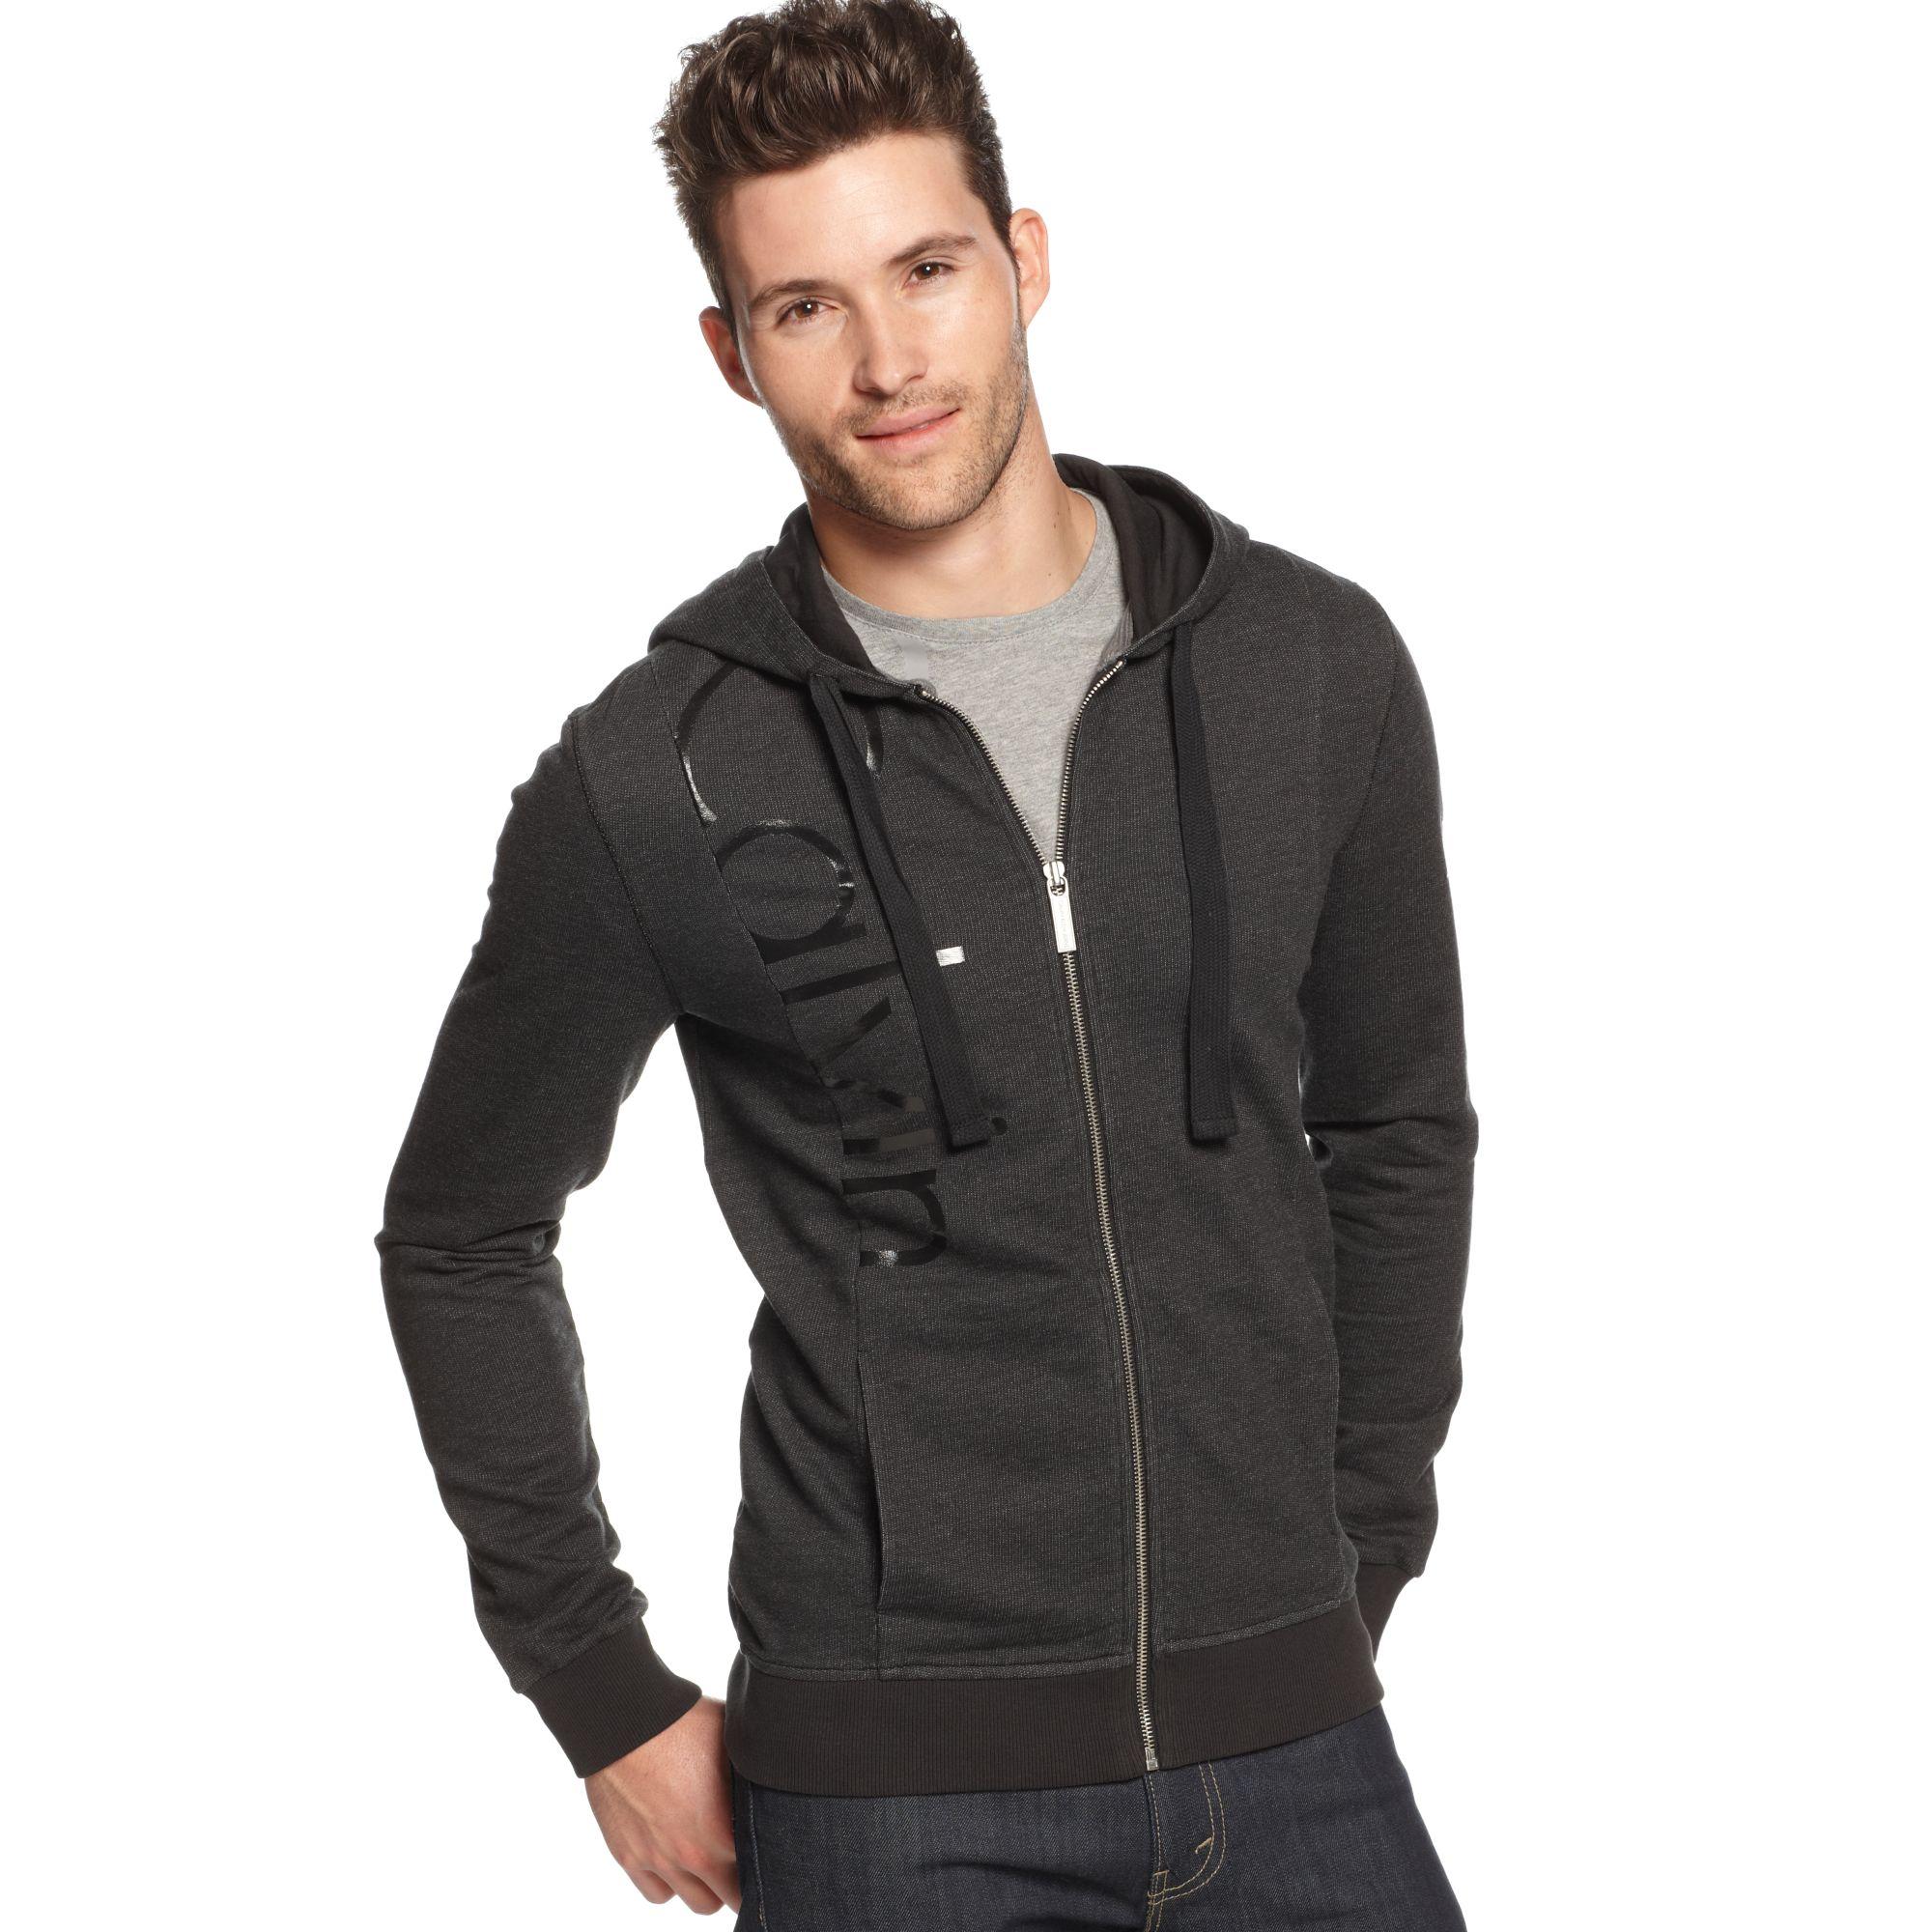 calvin klein jeans zip front logo hoodie in black for men lyst. Black Bedroom Furniture Sets. Home Design Ideas